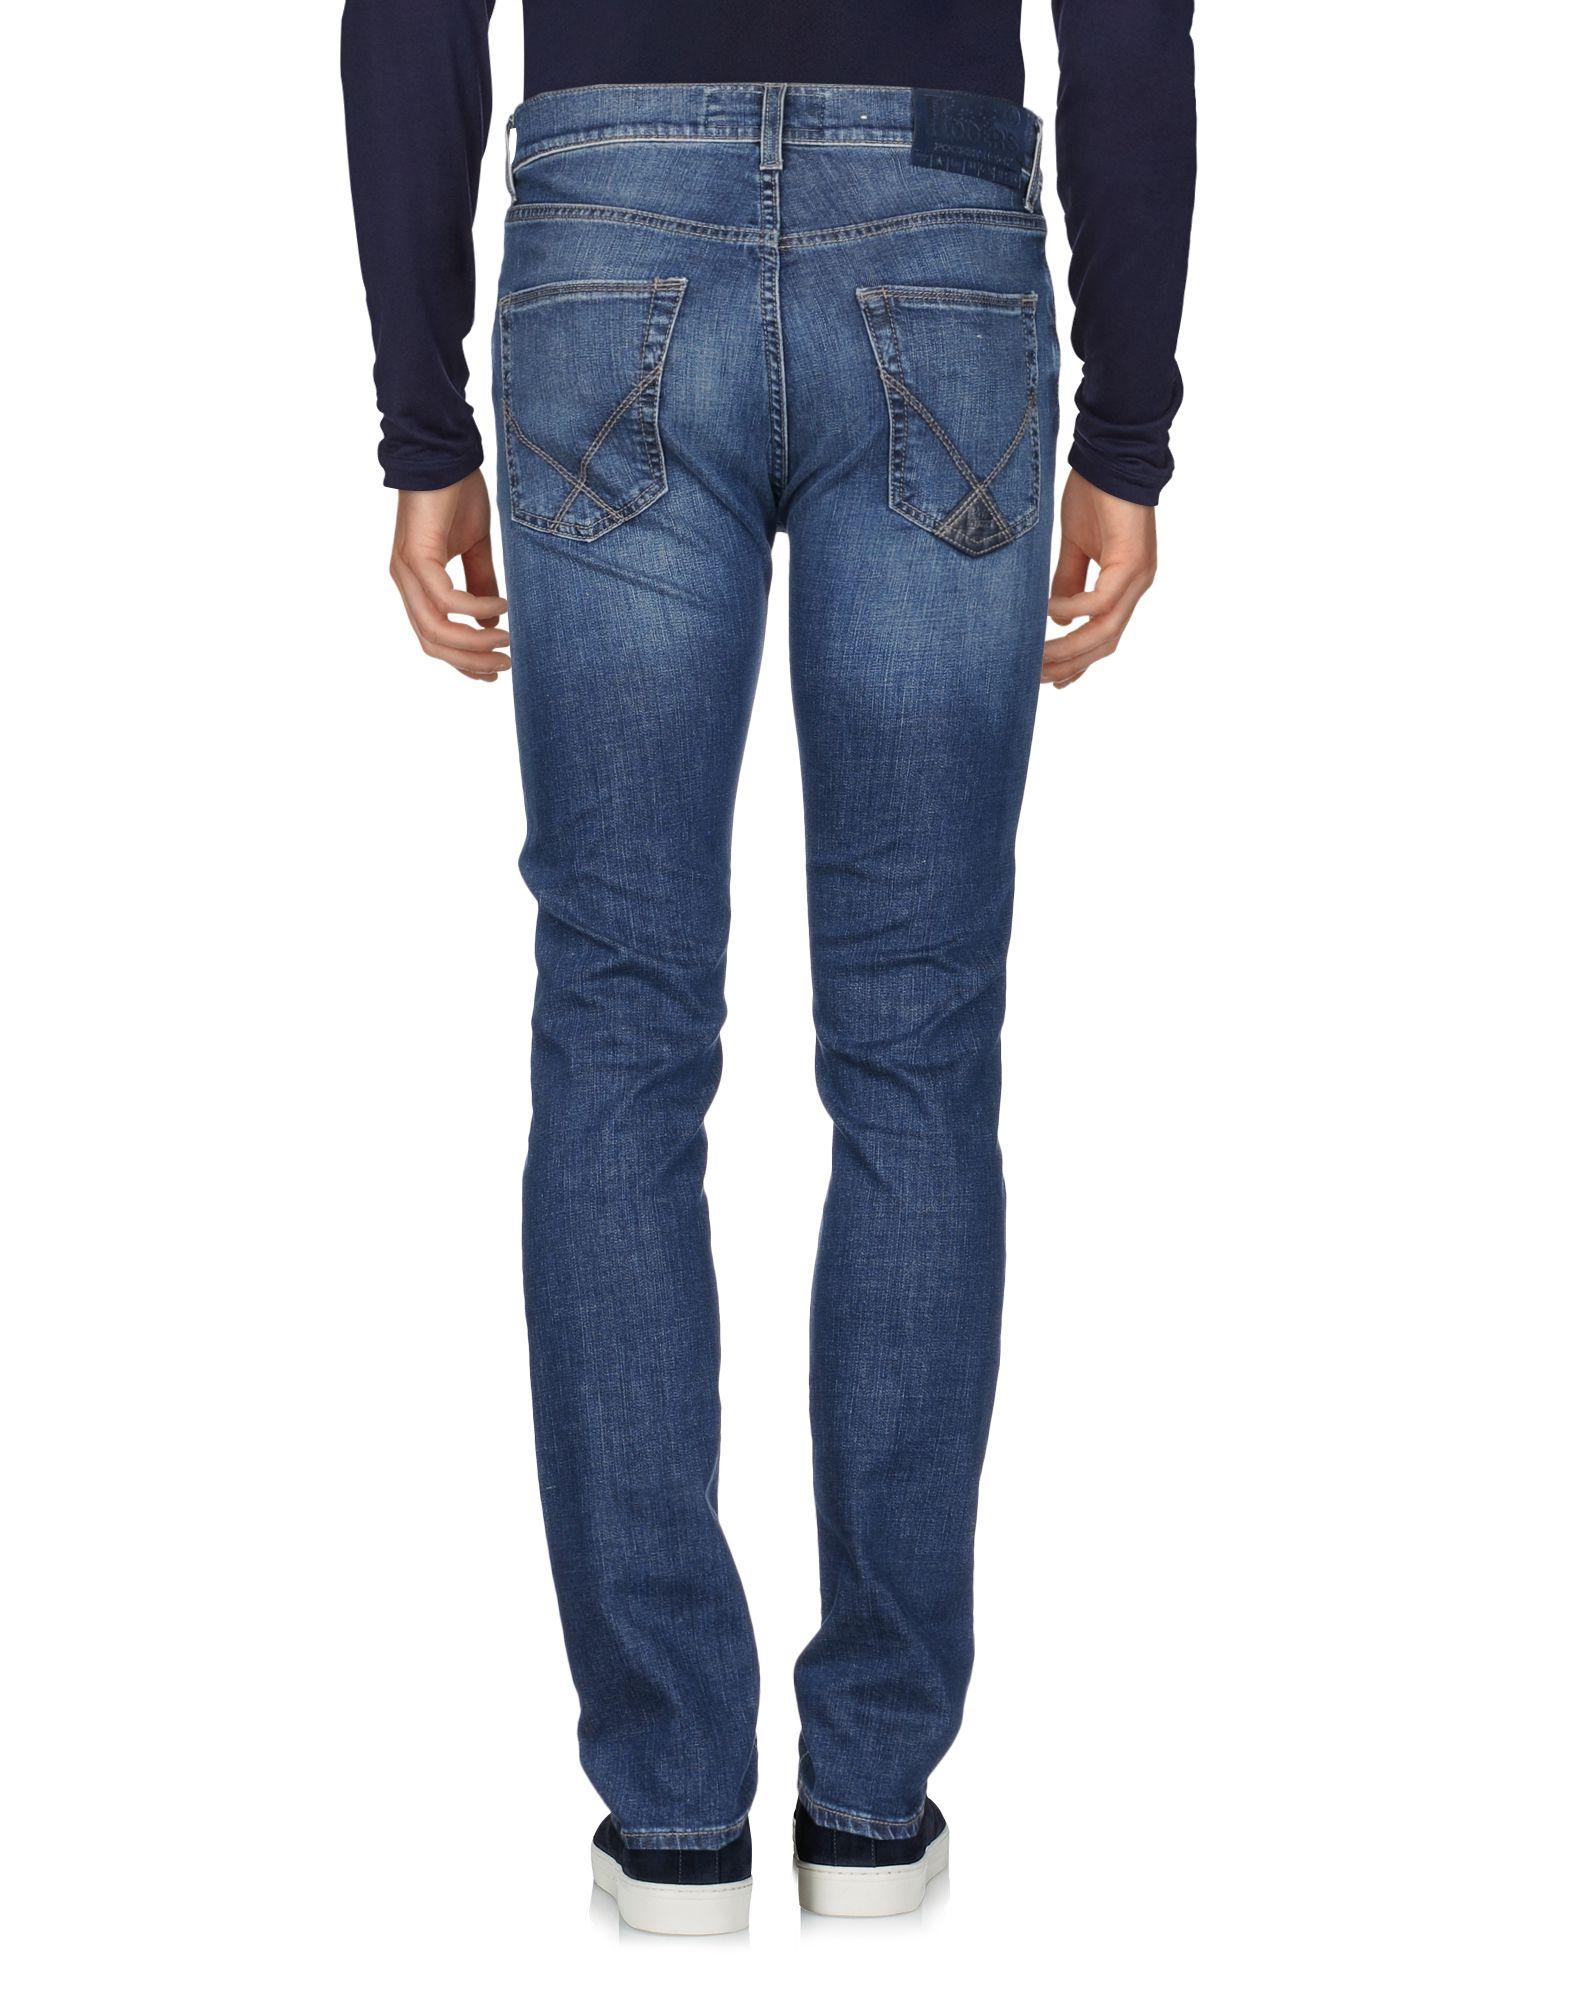 Pantaloni Jeans Ro  Roger's Uomo 42682101BK - 42682101BK Uomo 025e21